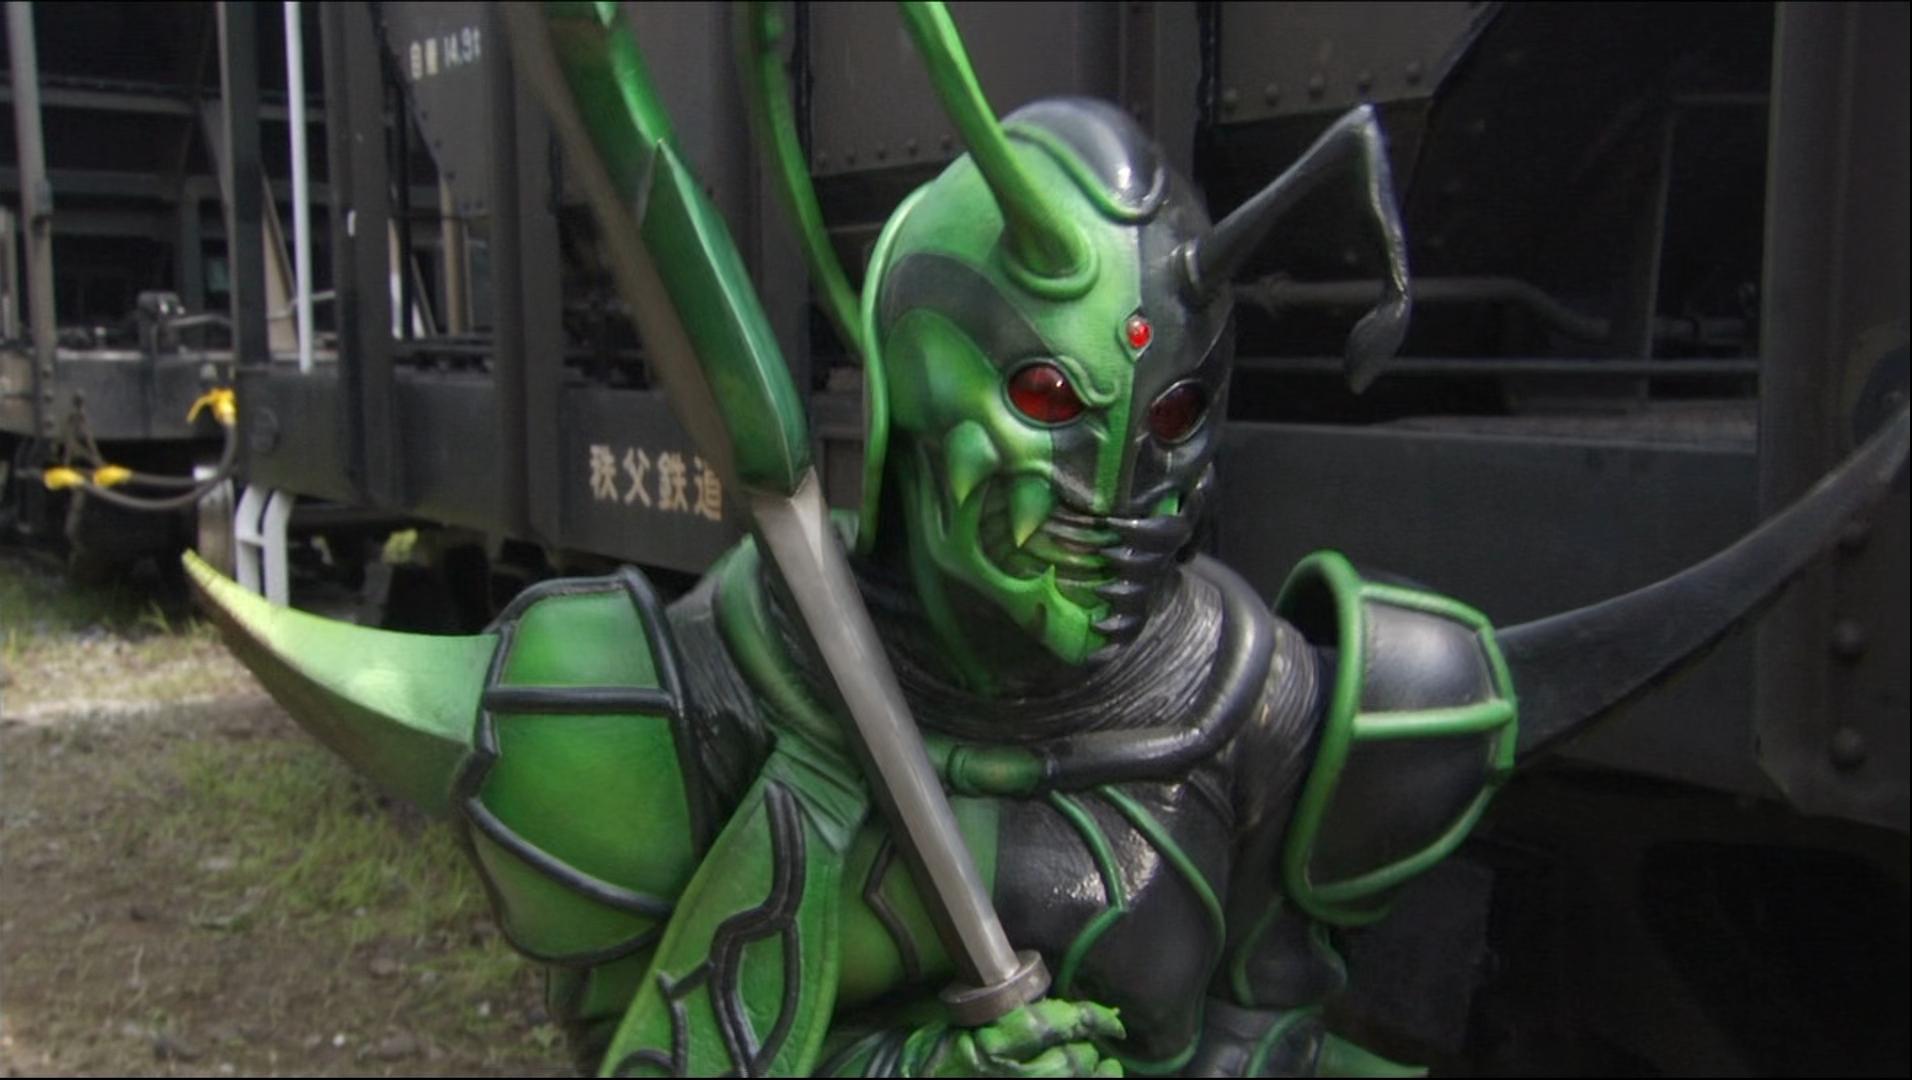 Anthopper Imagin Kirigiris